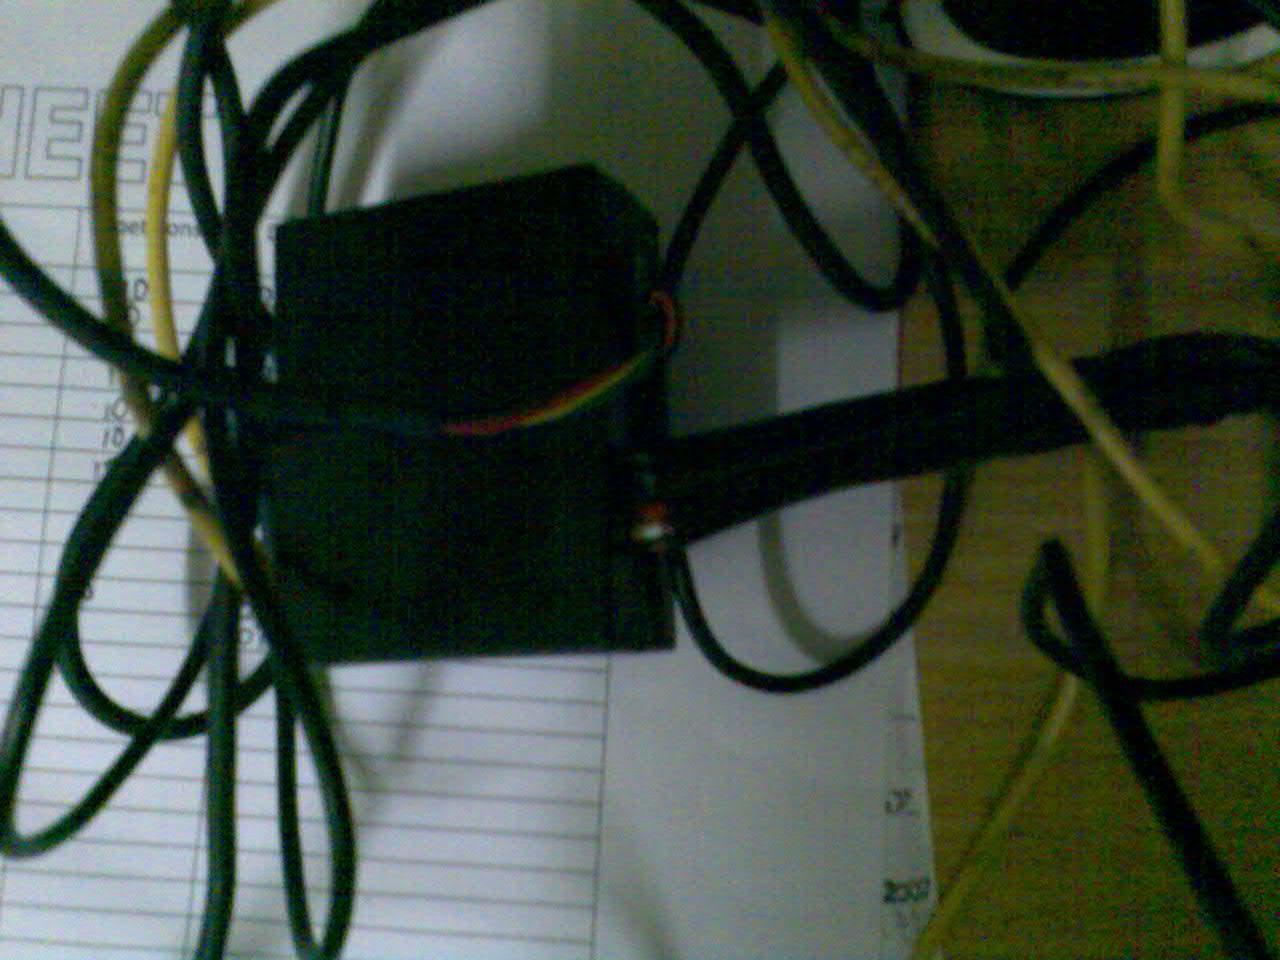 how to install apexi turbo timer tutorials diy faq sau post 36645 1195725451 thumb jpg